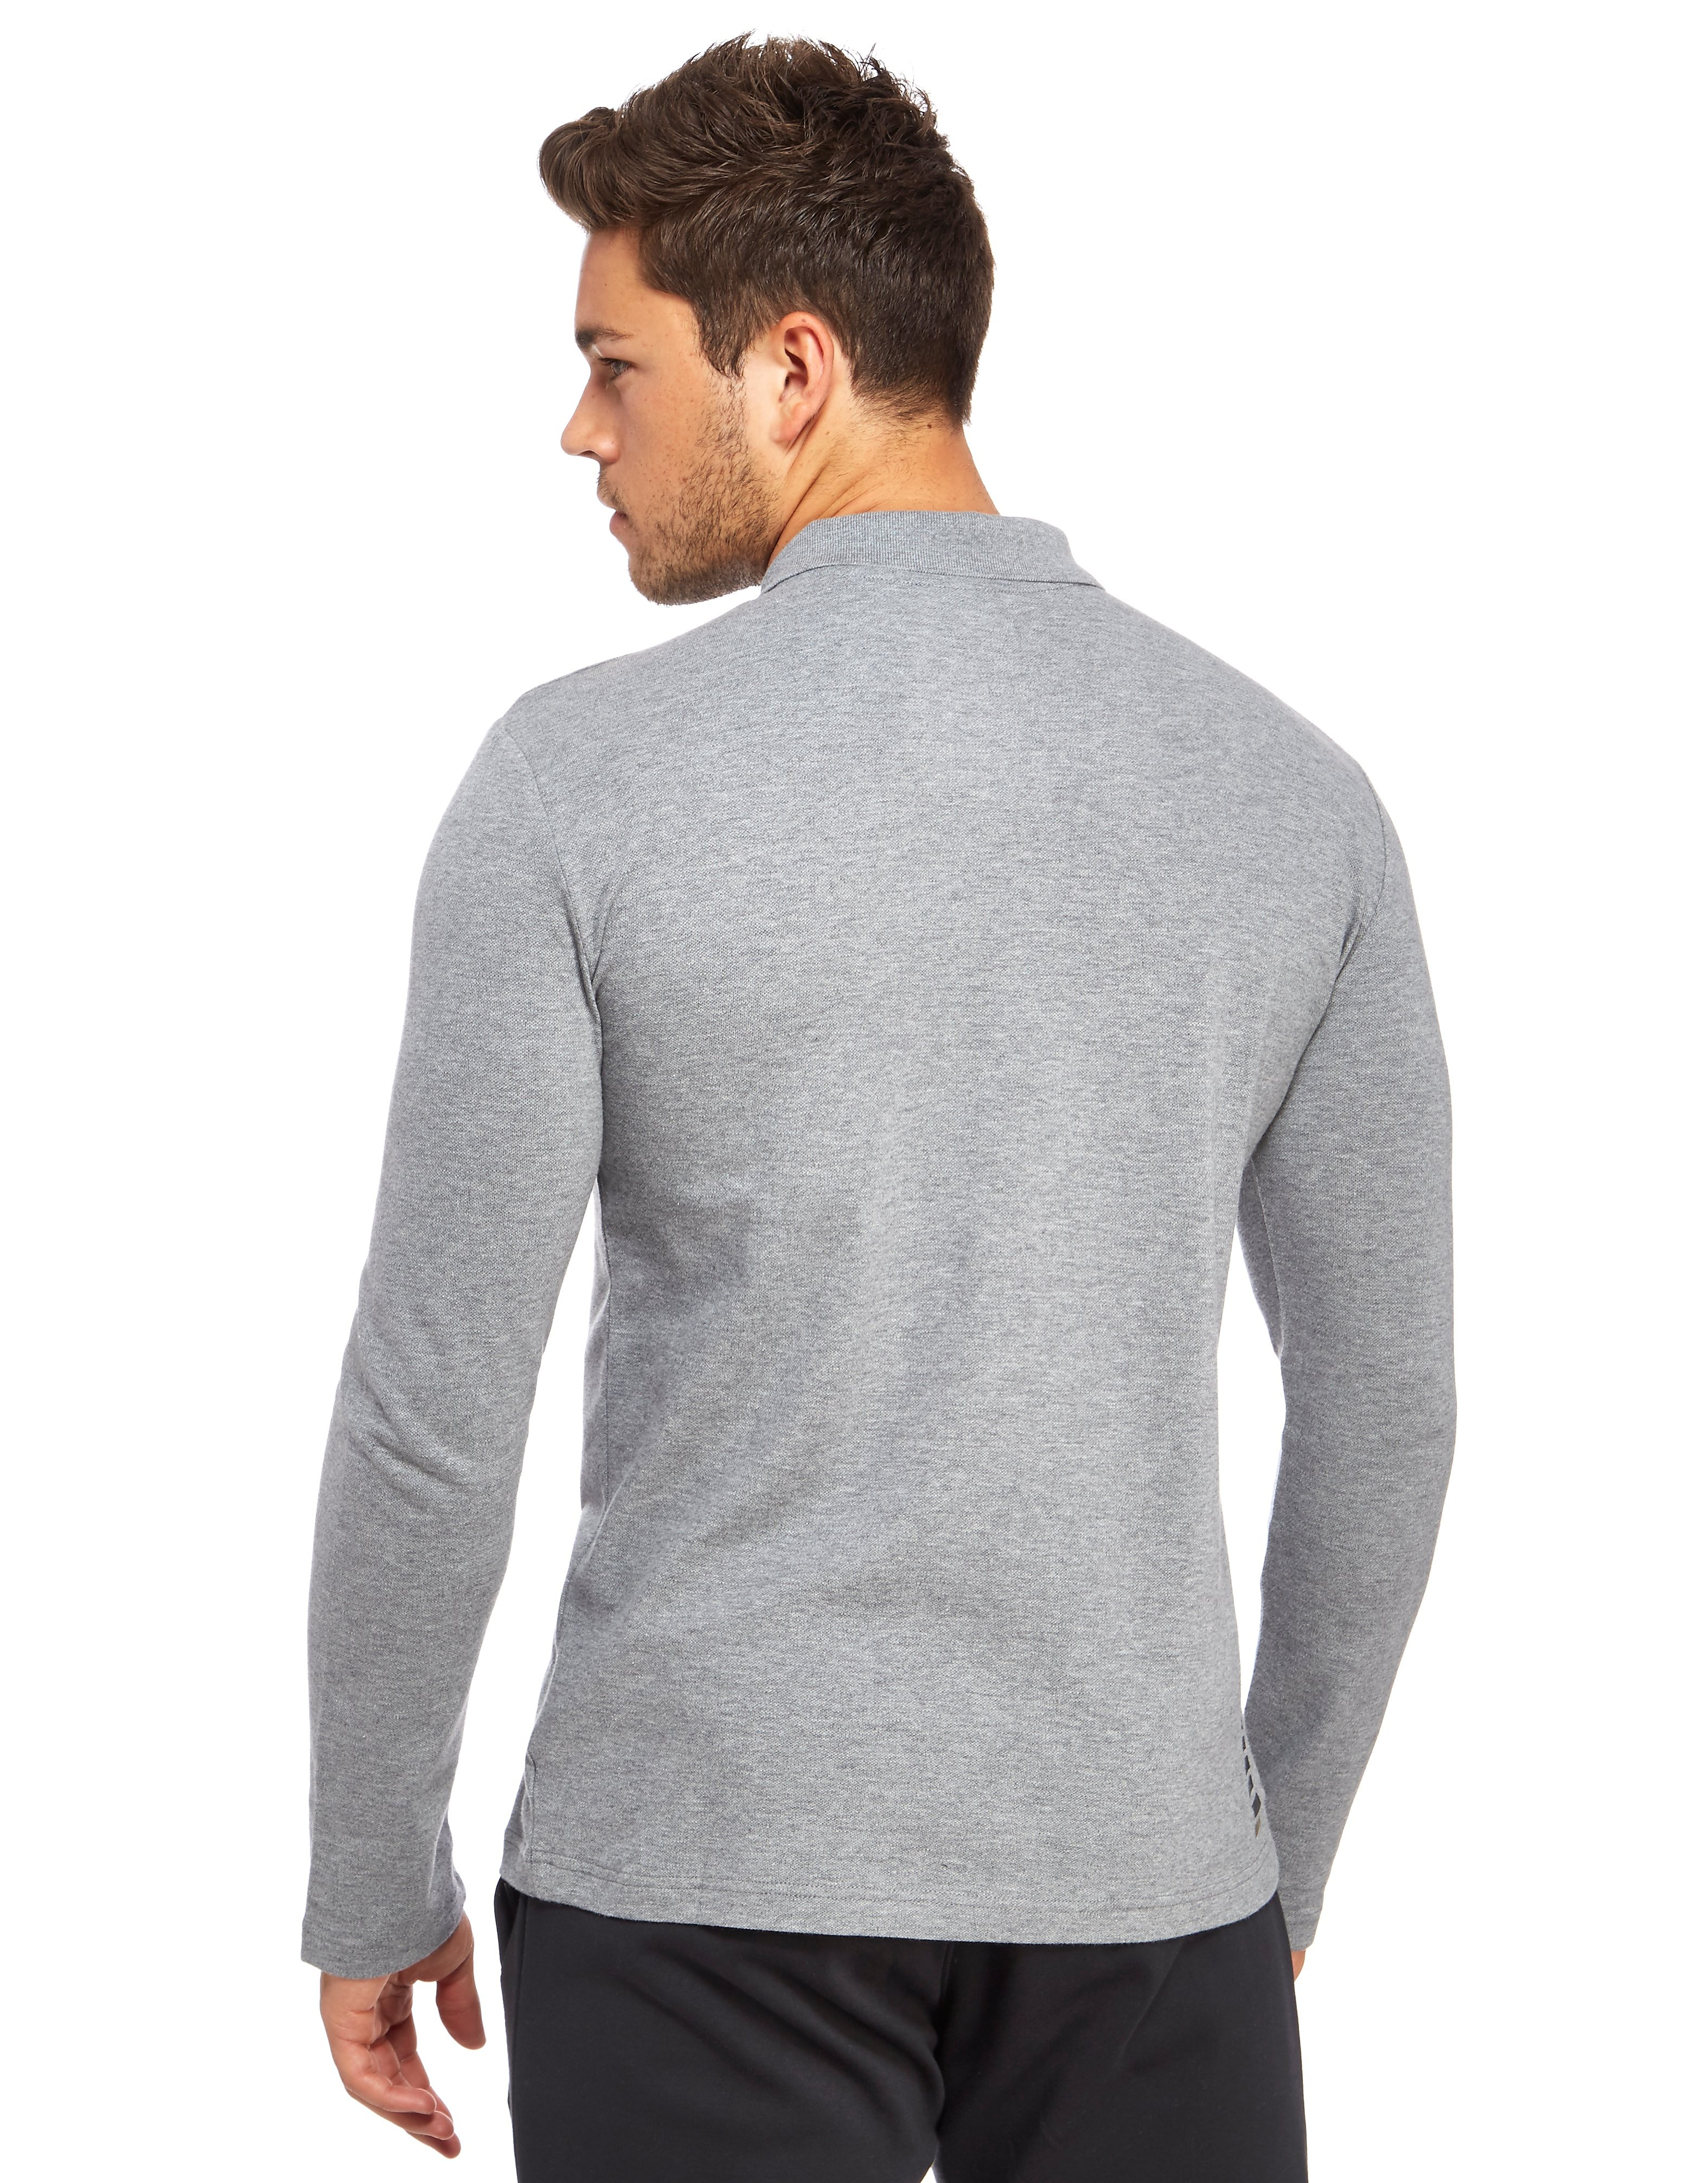 Emporio Armani EA7 Core Pique Longsleeve Polo Shirt